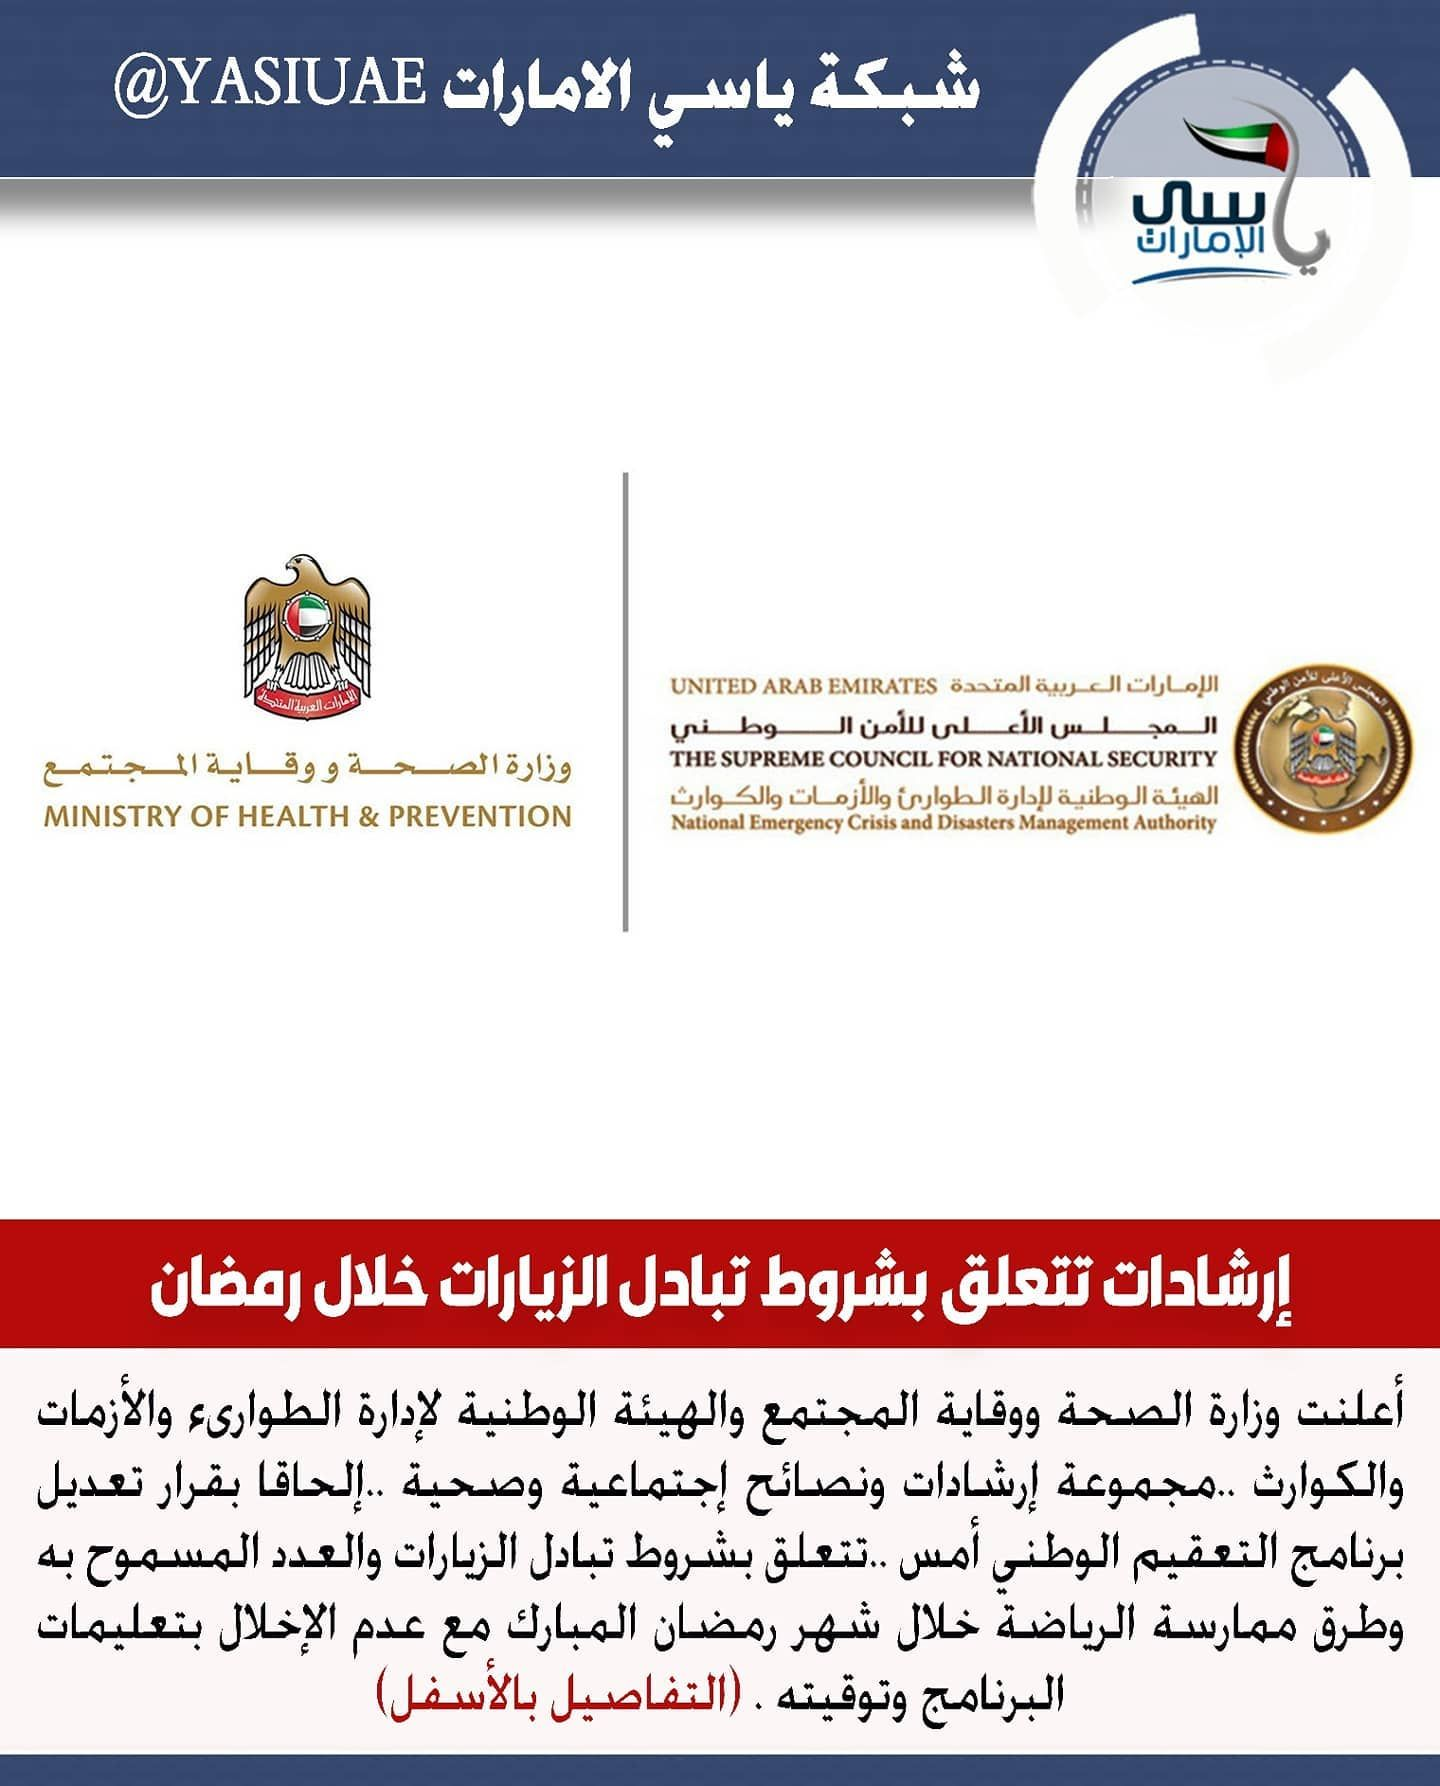 Www Yasiuae Net أولا السماح للأقرباء من الدرجة الأولى والثانية بتبادل الزيارات مع تفادي زيارة الأشخاص الأكثر عرضة ل Disasters Prevention United Arab Emirates